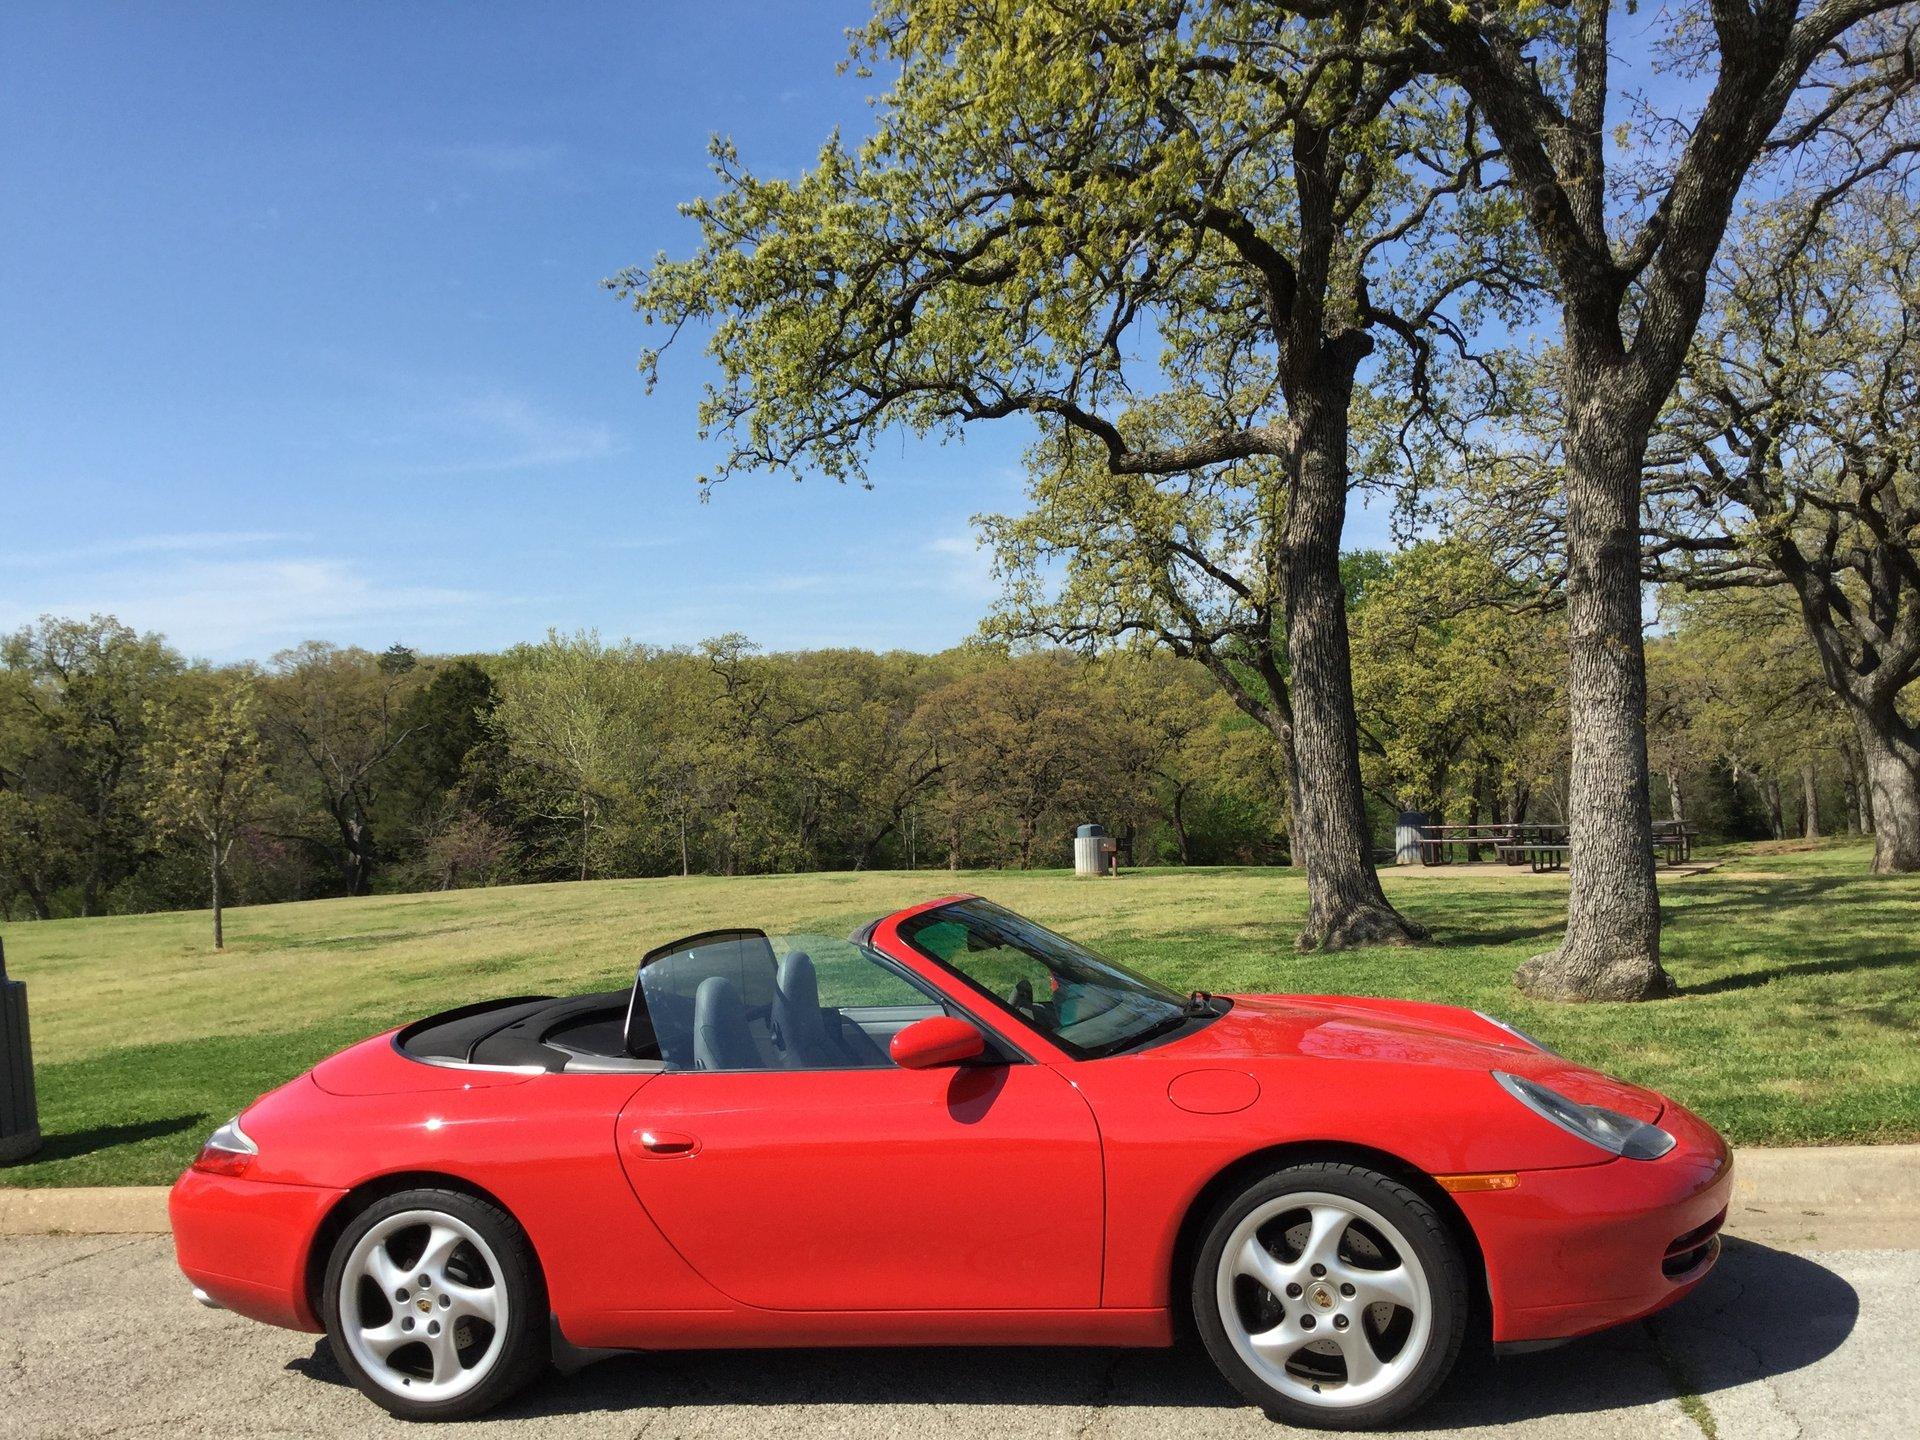 1999 Porsche 911 Carrera | Texas Motor Works